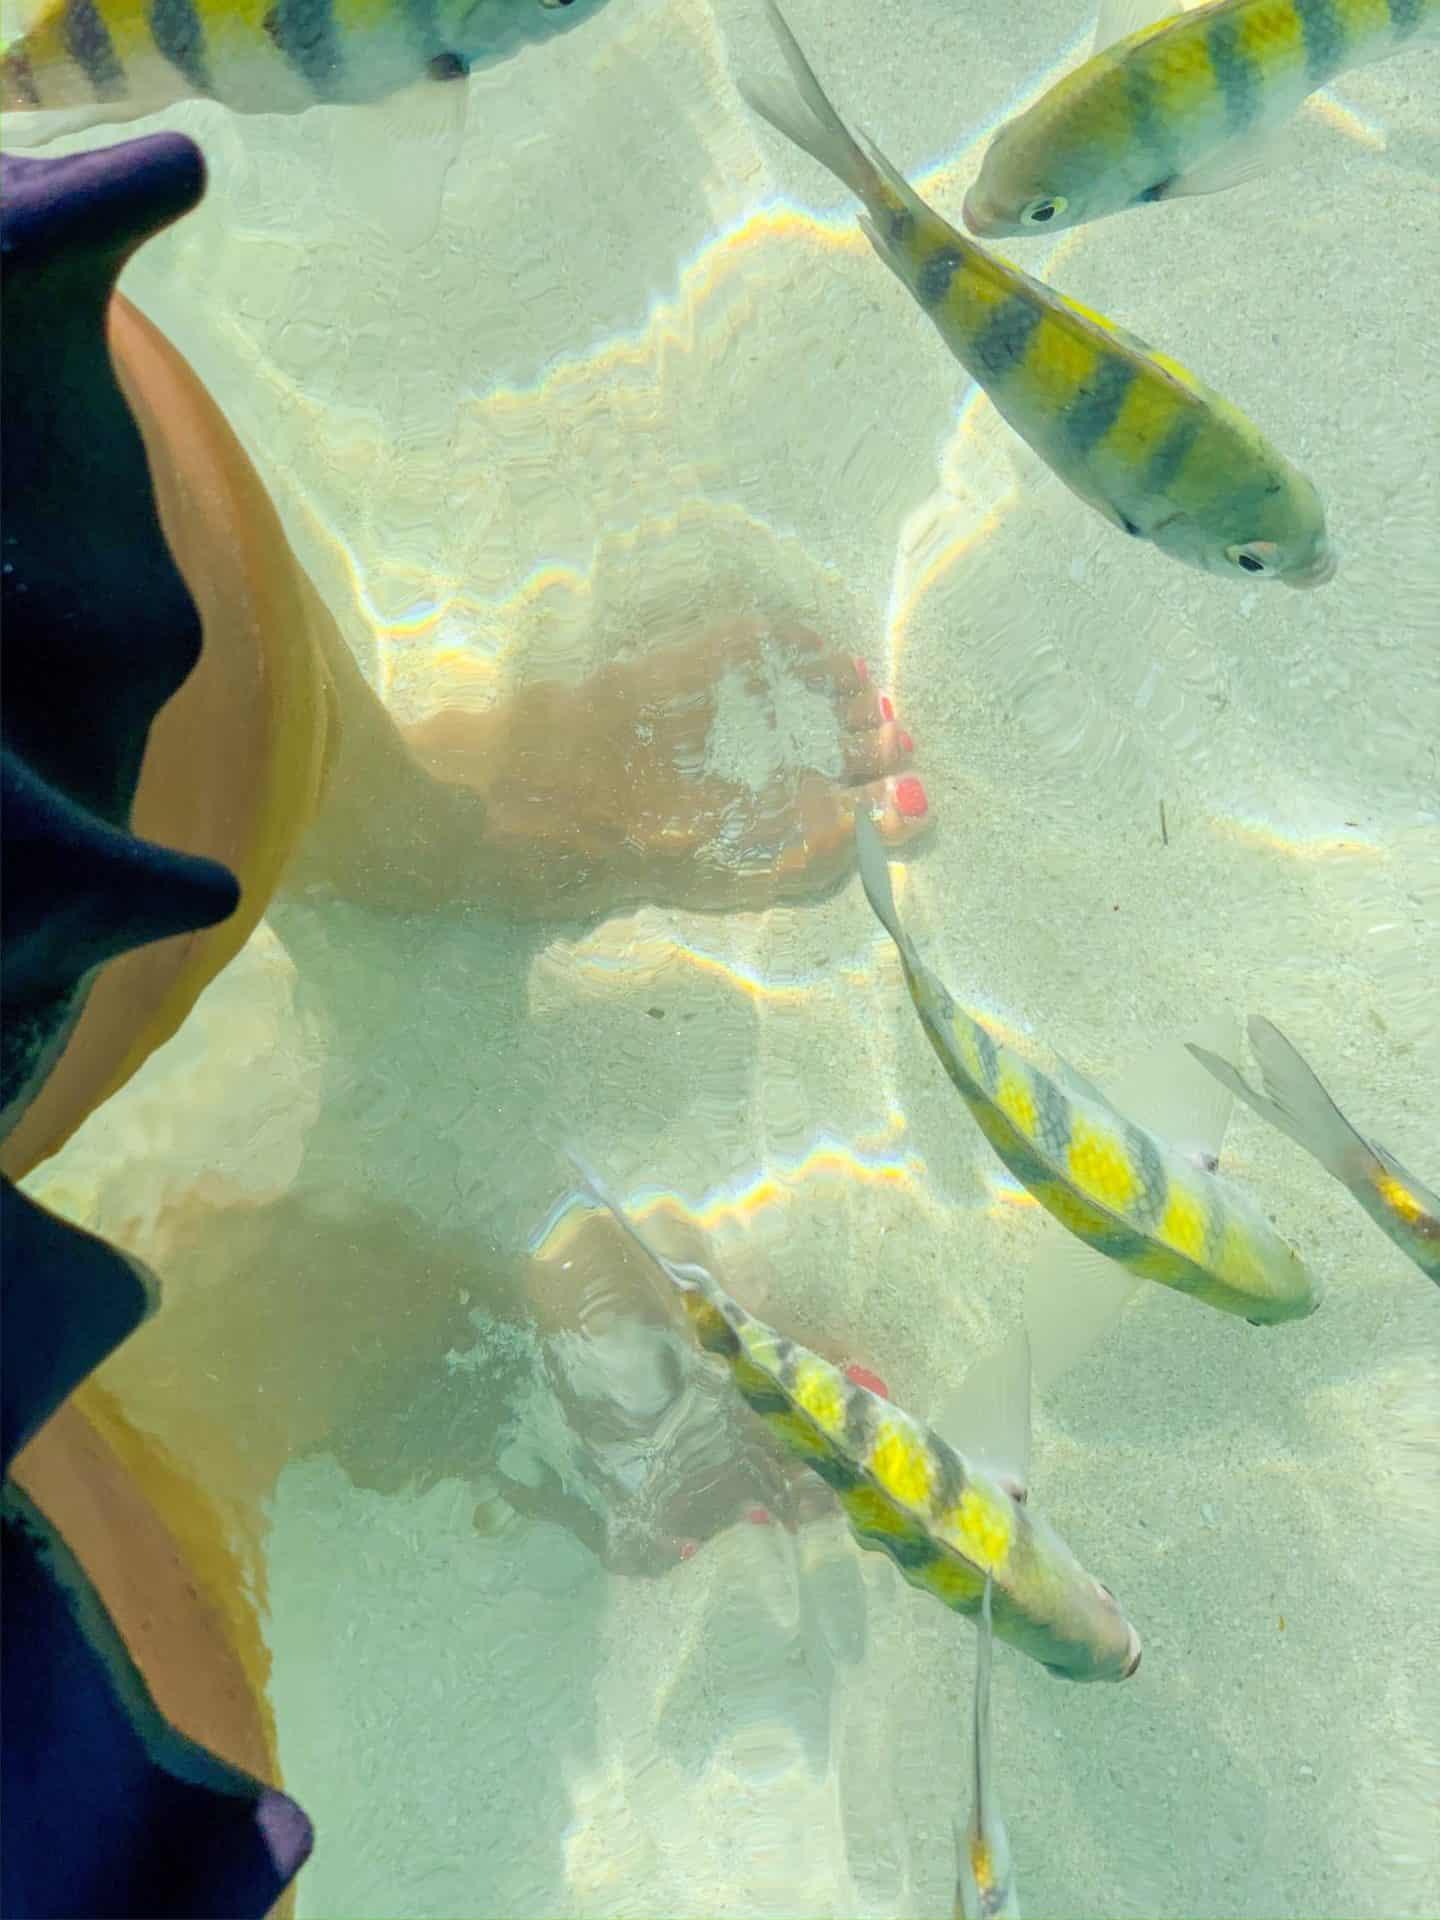 Shaunda Necole- Clear waters with tropical fish swimming around your feet at Isla Roatan beaches in Honduras